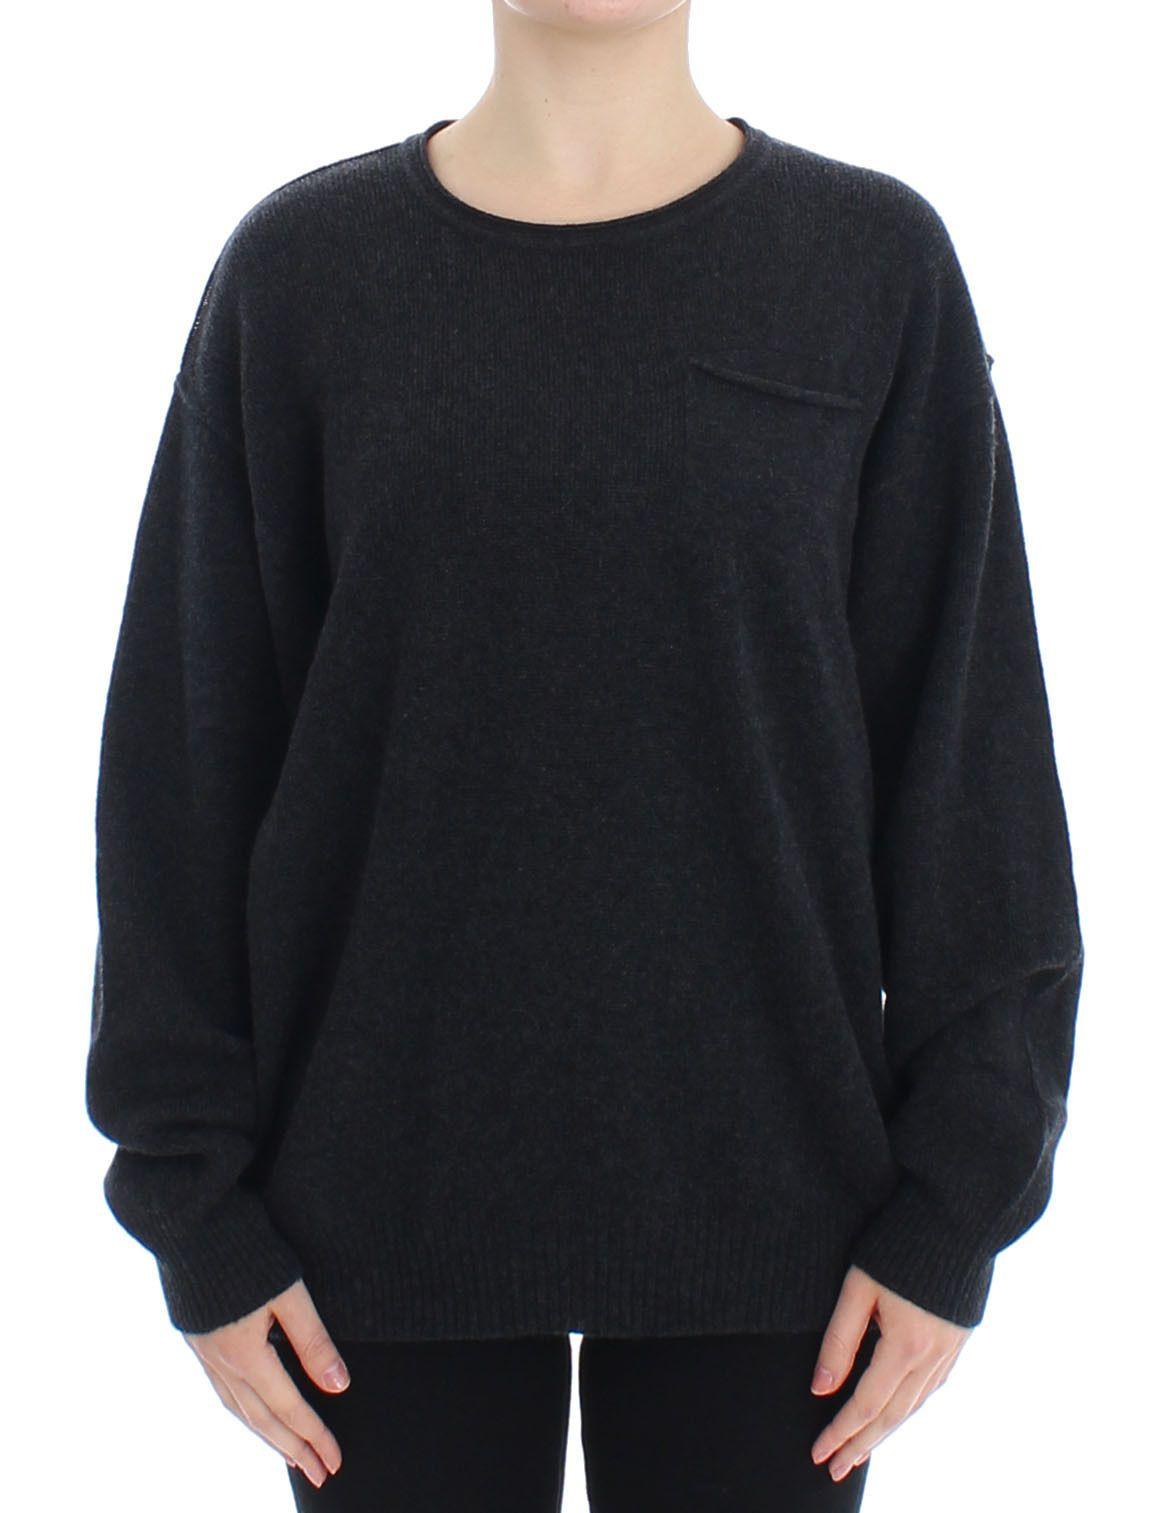 Dolce & Gabbana Women's Cashmere Crewneck Sweater Gray SIG13348 - IT40|S